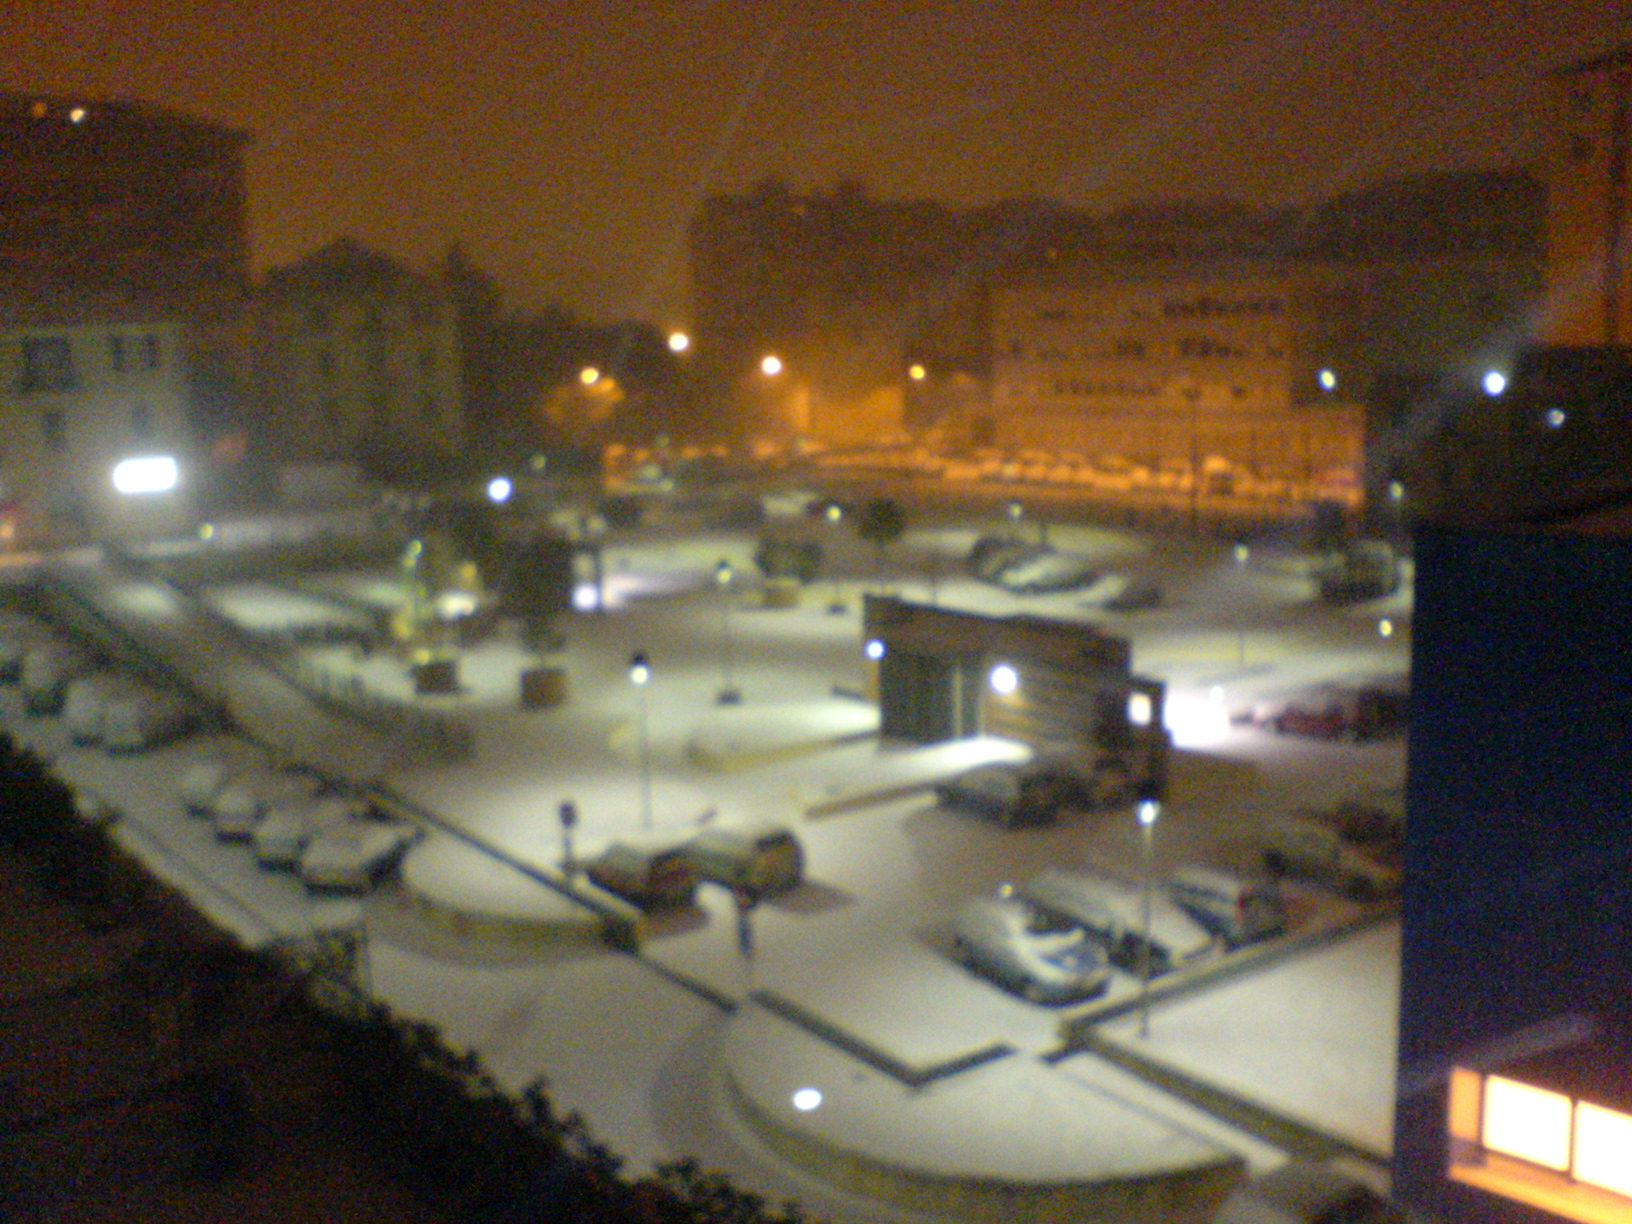 Savona di notte ricoperta da un manto di neve